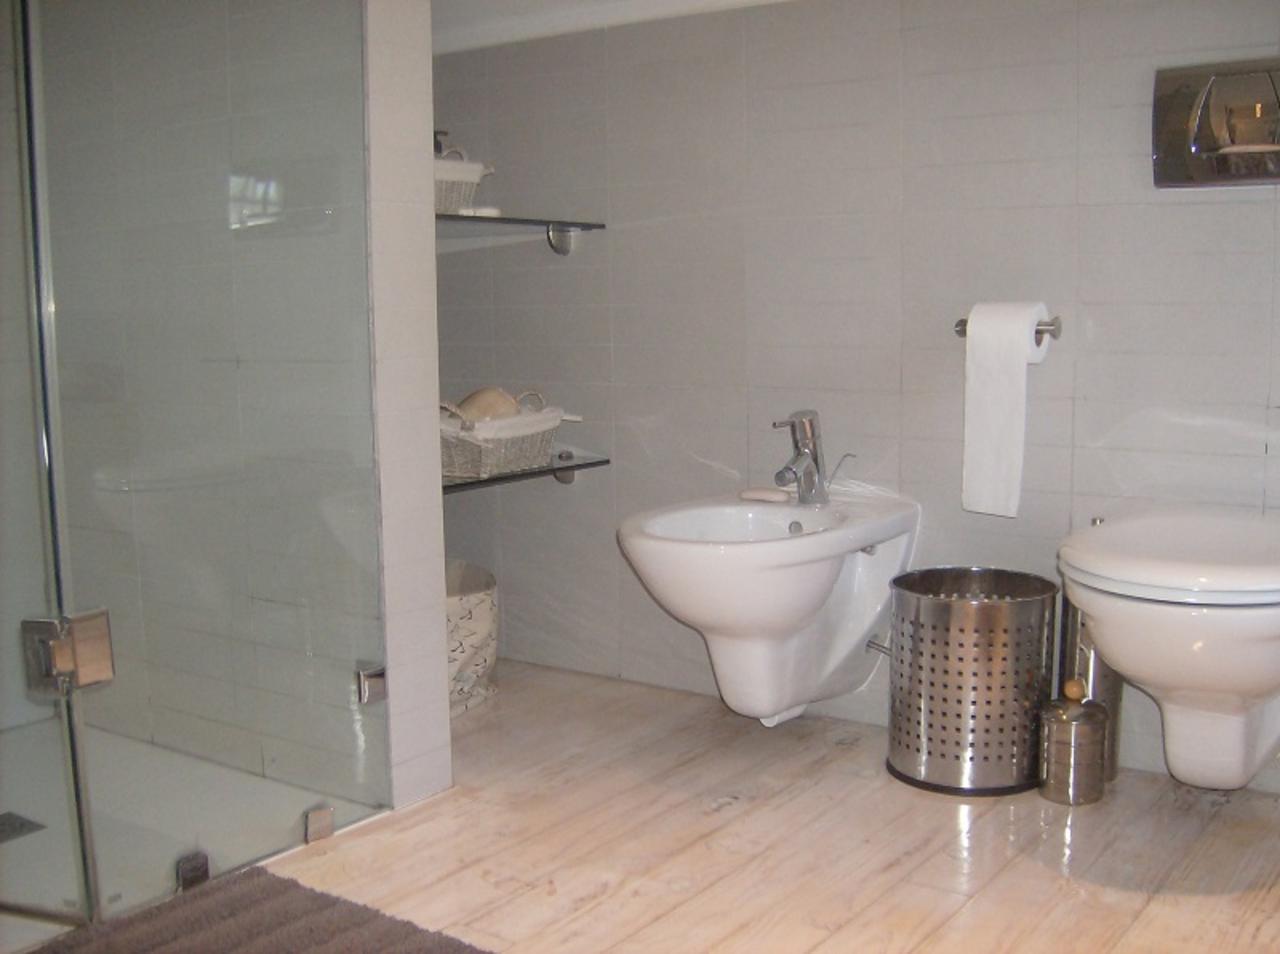 Open plan ensuite bathroom ideas -  Open Plan Design Which Easily Flows To The Glorious Ensuite Ensuite Bathroom Shower Bath Bidet